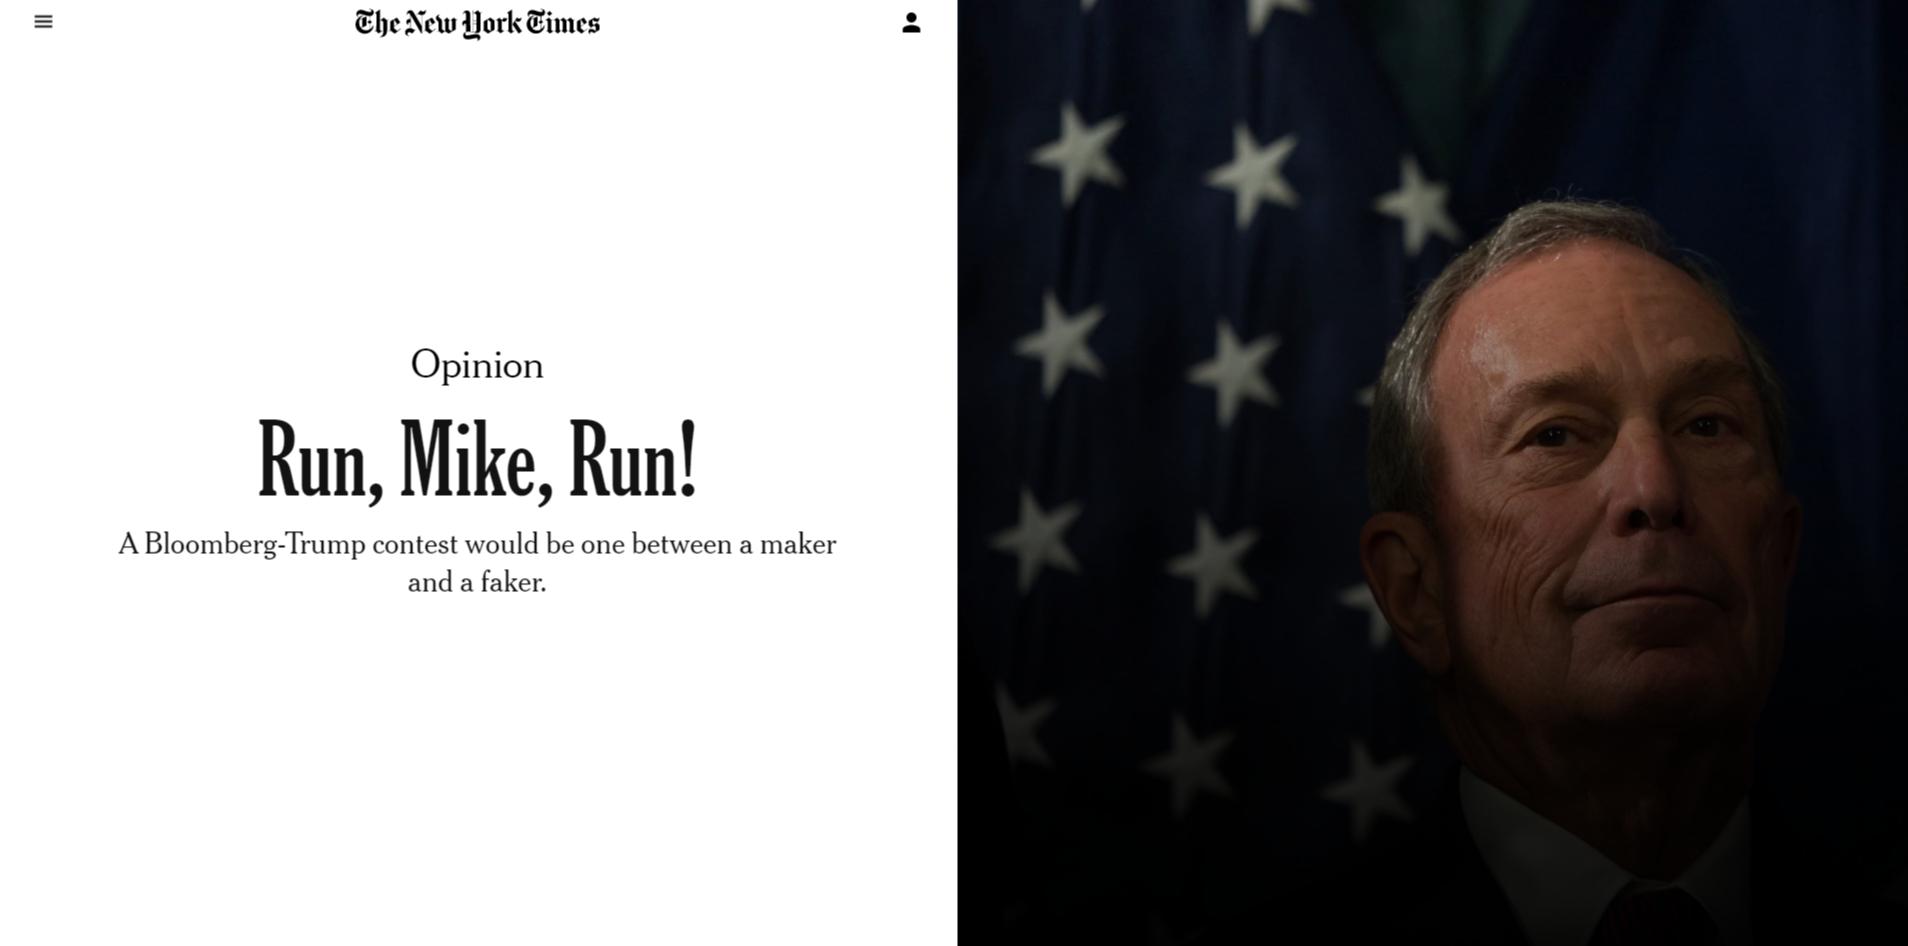 Bloomberg New York Times Endorsement